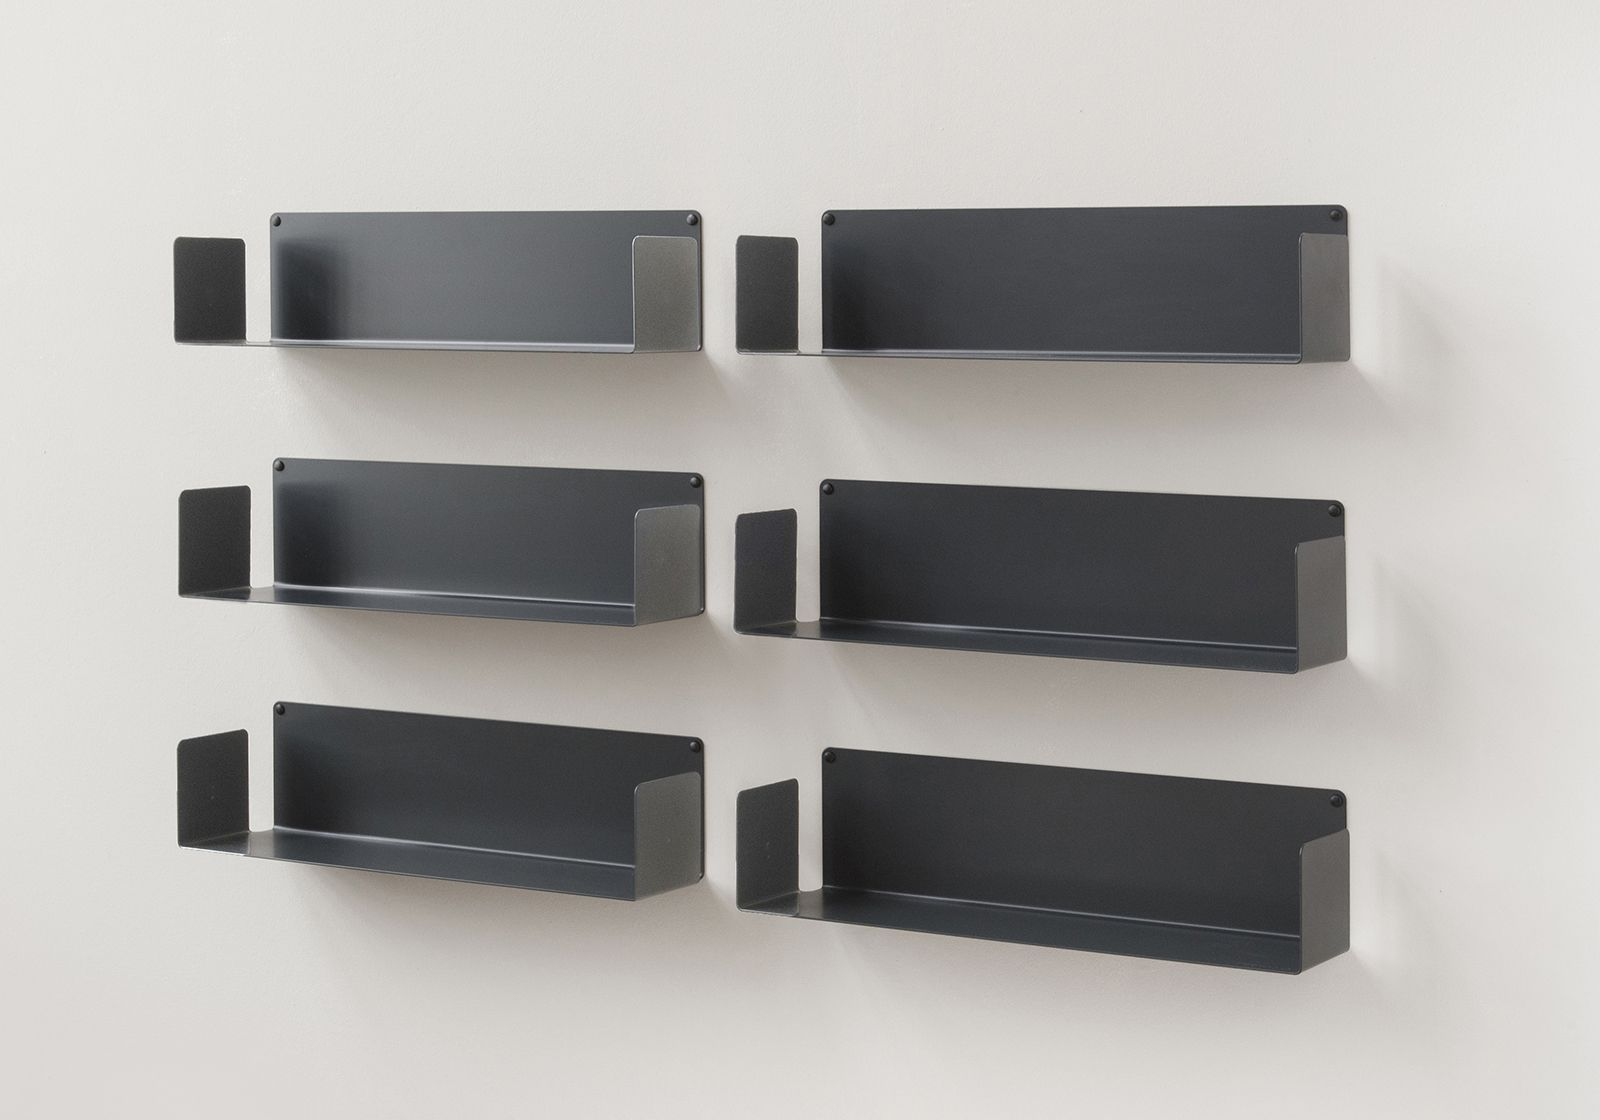 DVD shelves - Set of 6 UDVD